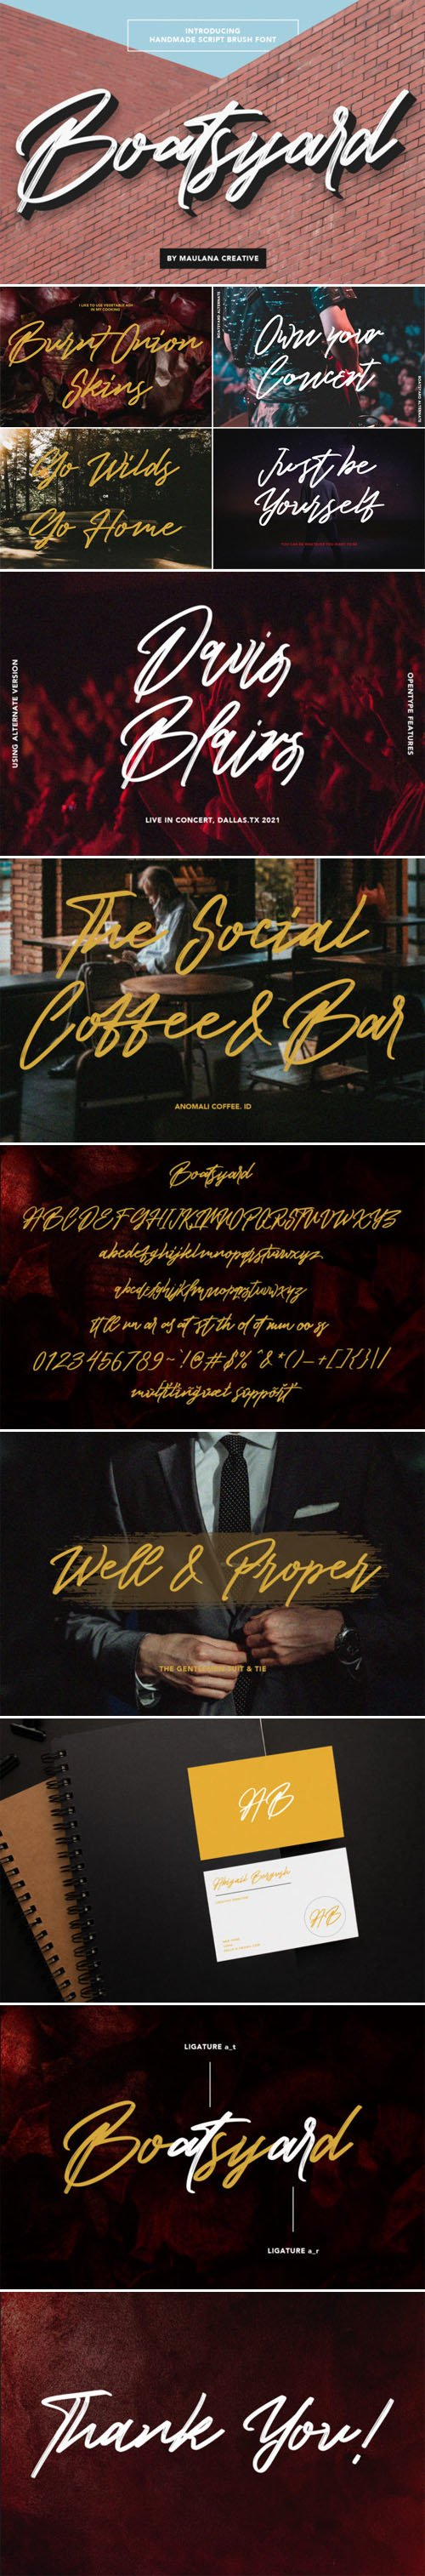 Boatsyard - Lovely Brushed Handwritten Font [2-Weights]